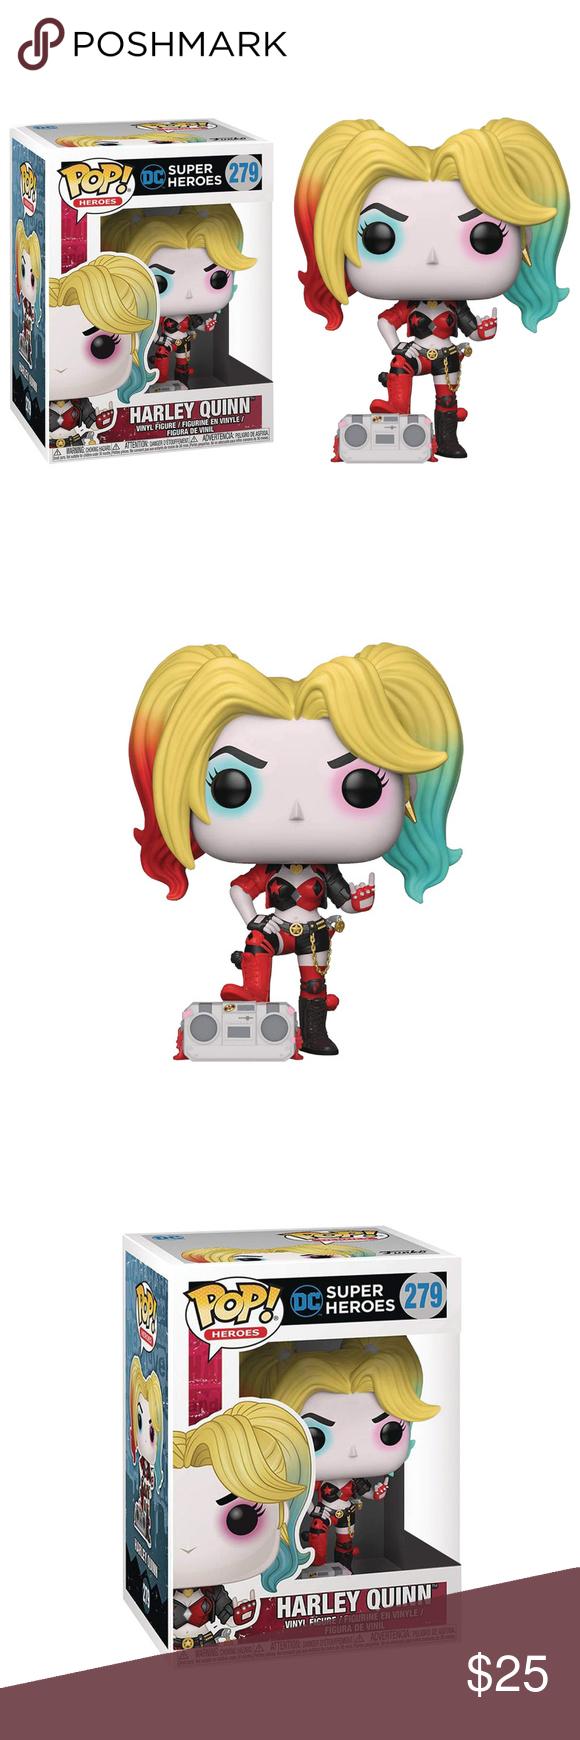 Funko Pop Harley Quinn 279 Exclusive PX